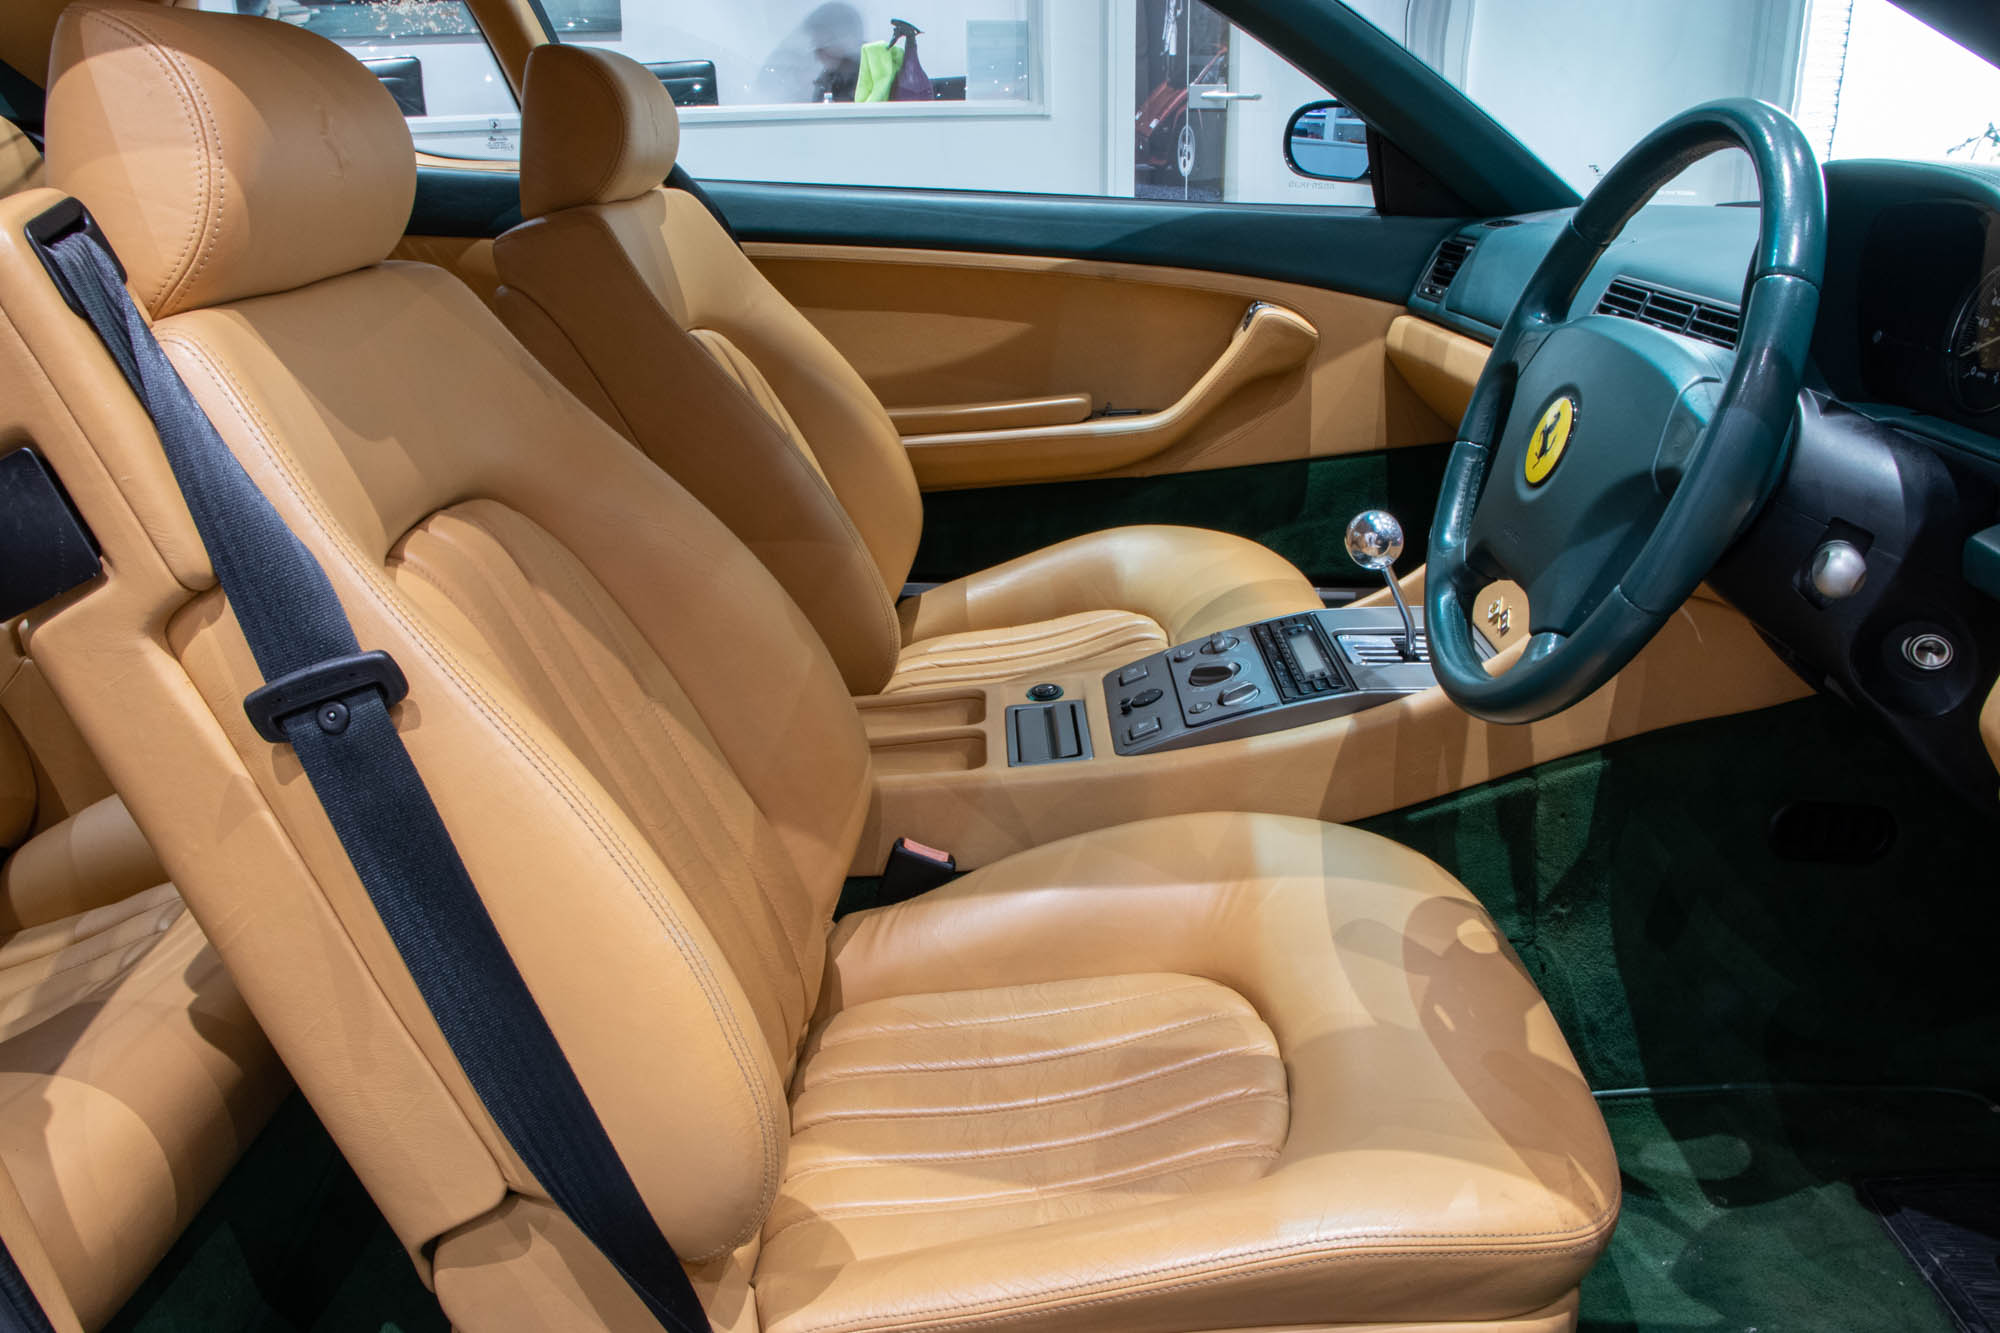 Ferrari 456 Green - Details-8